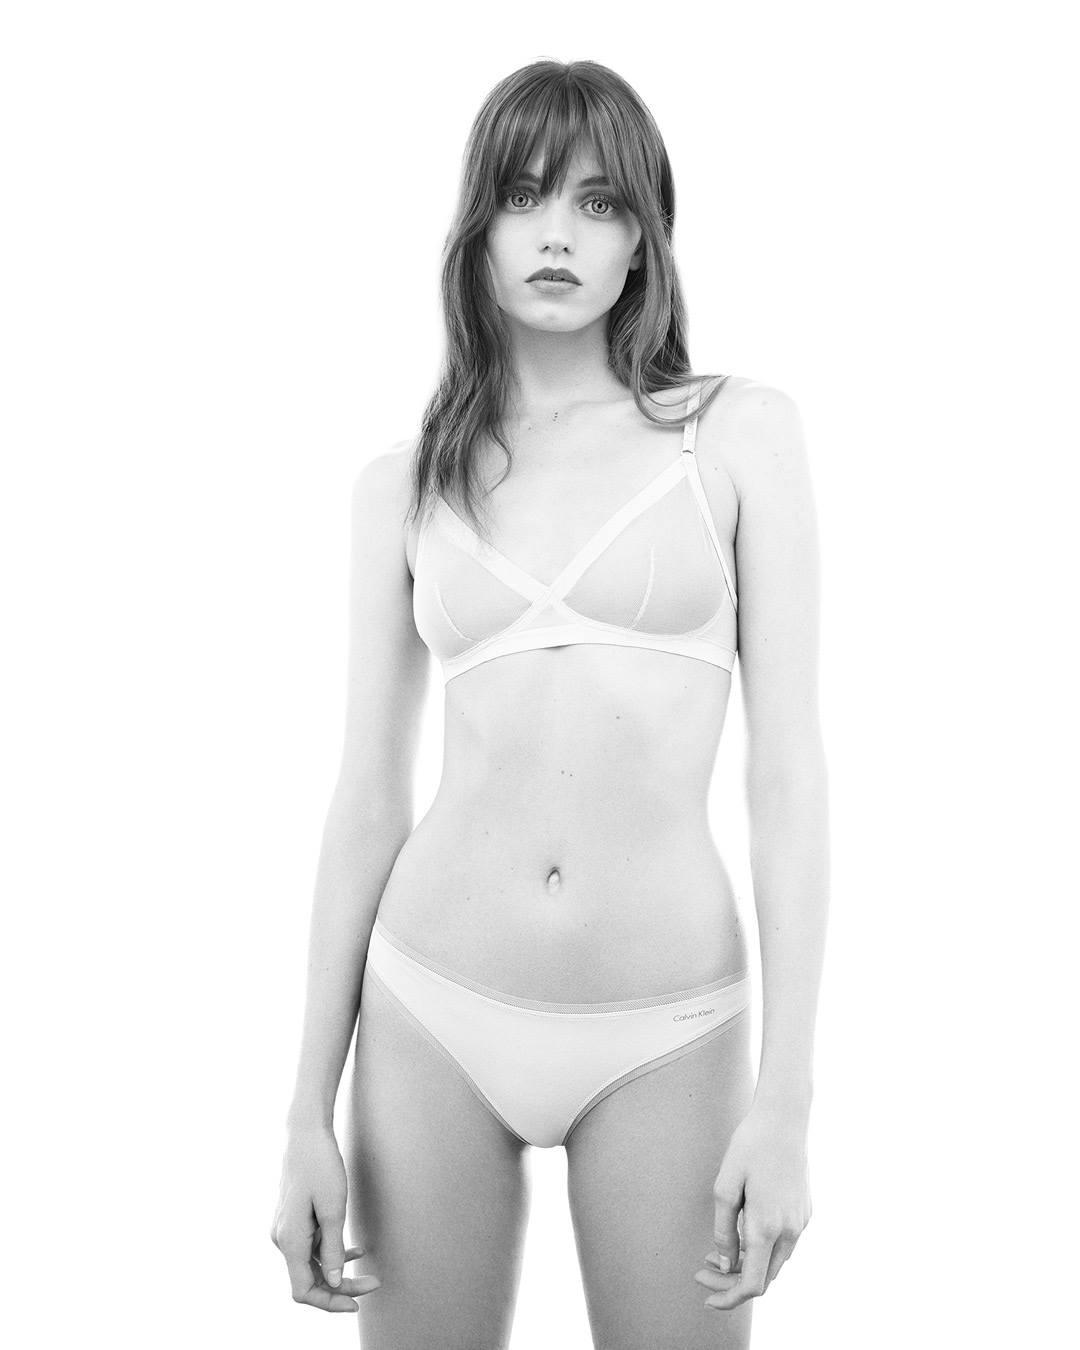 Calvin Klein Underwear Fall 2017 Ad Campaign